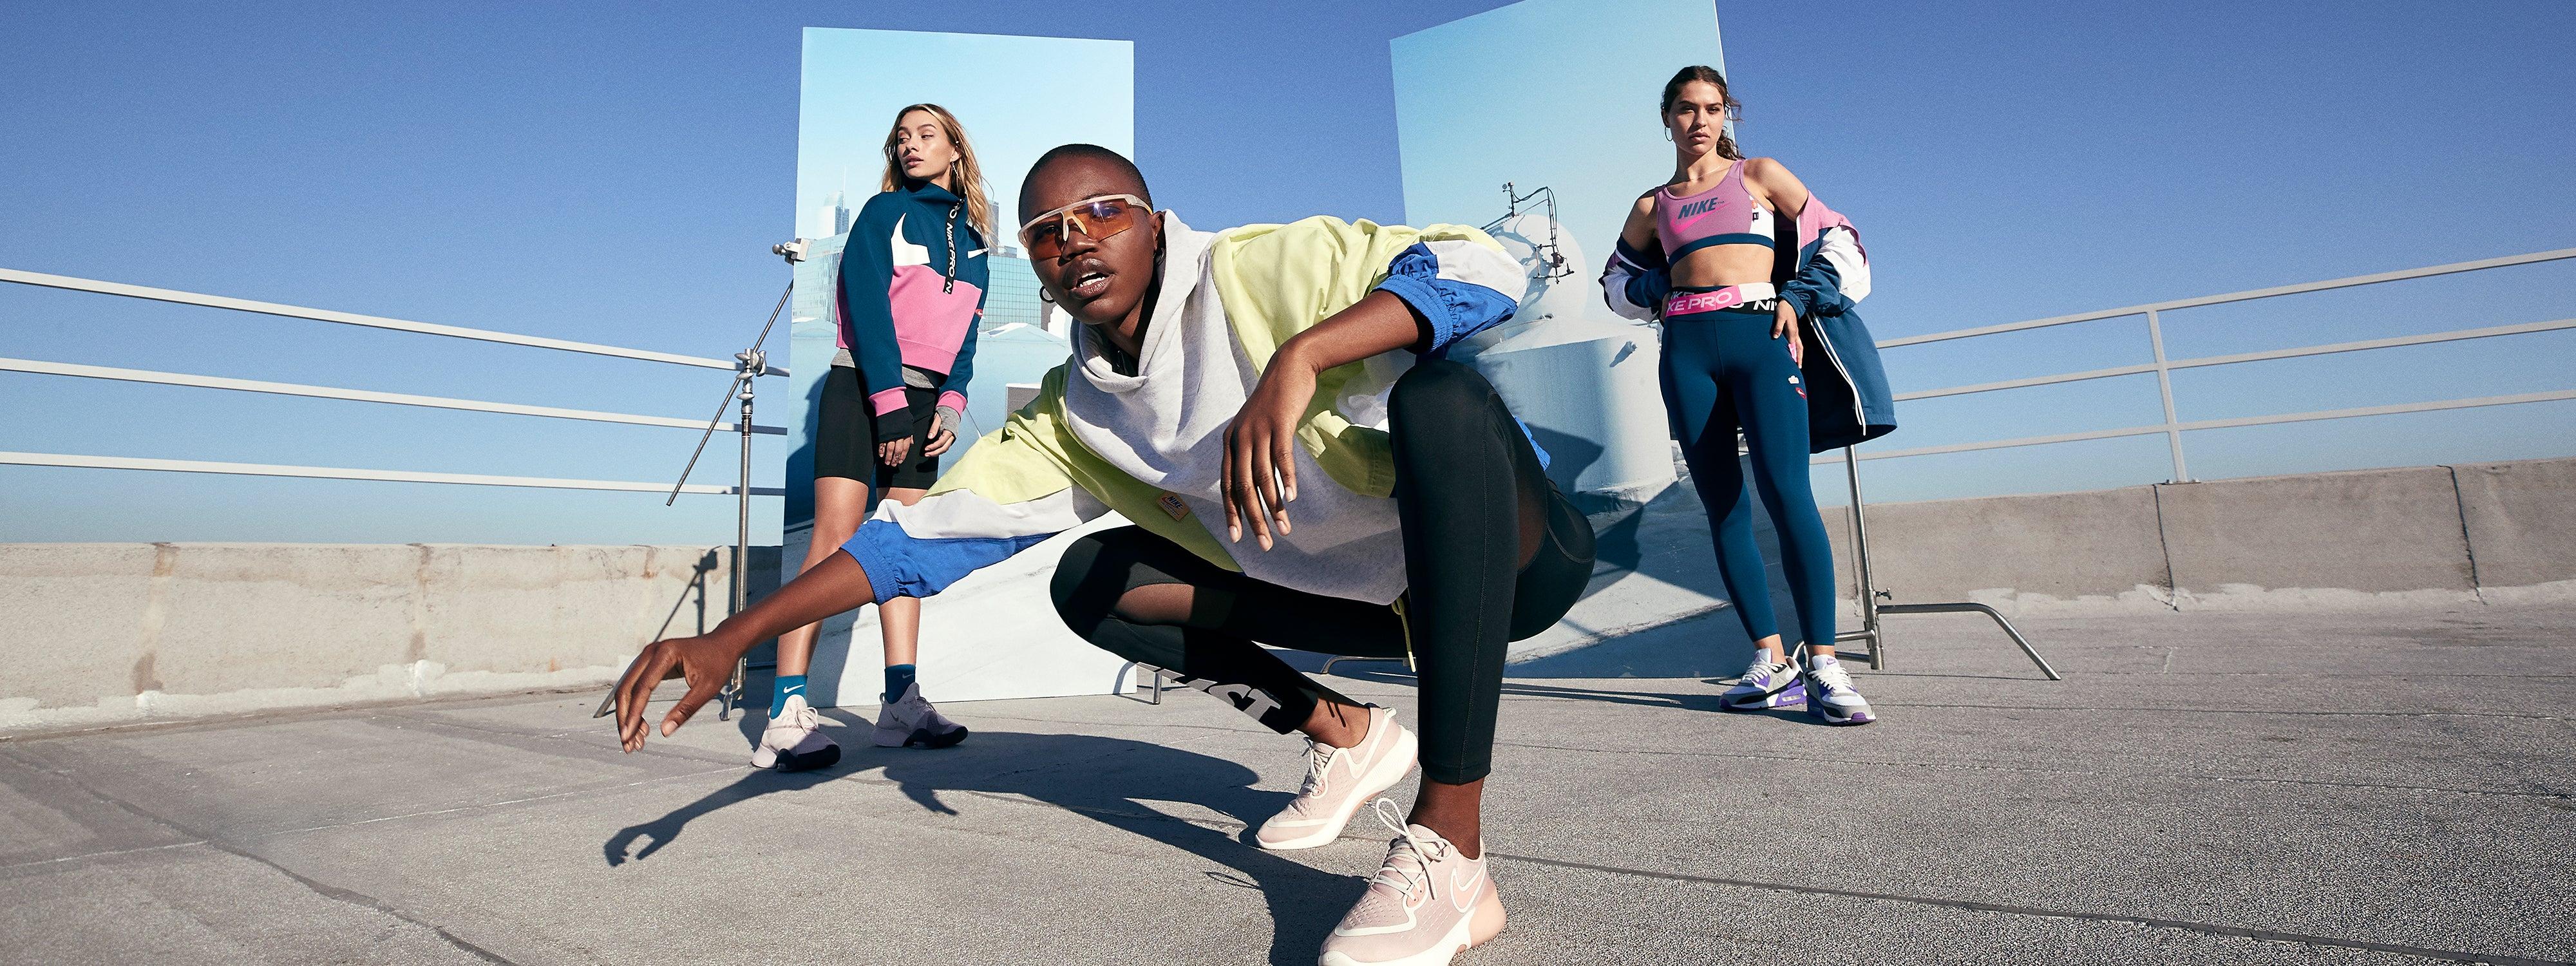 Chaussures record de Nike: World Athletics se prononcera